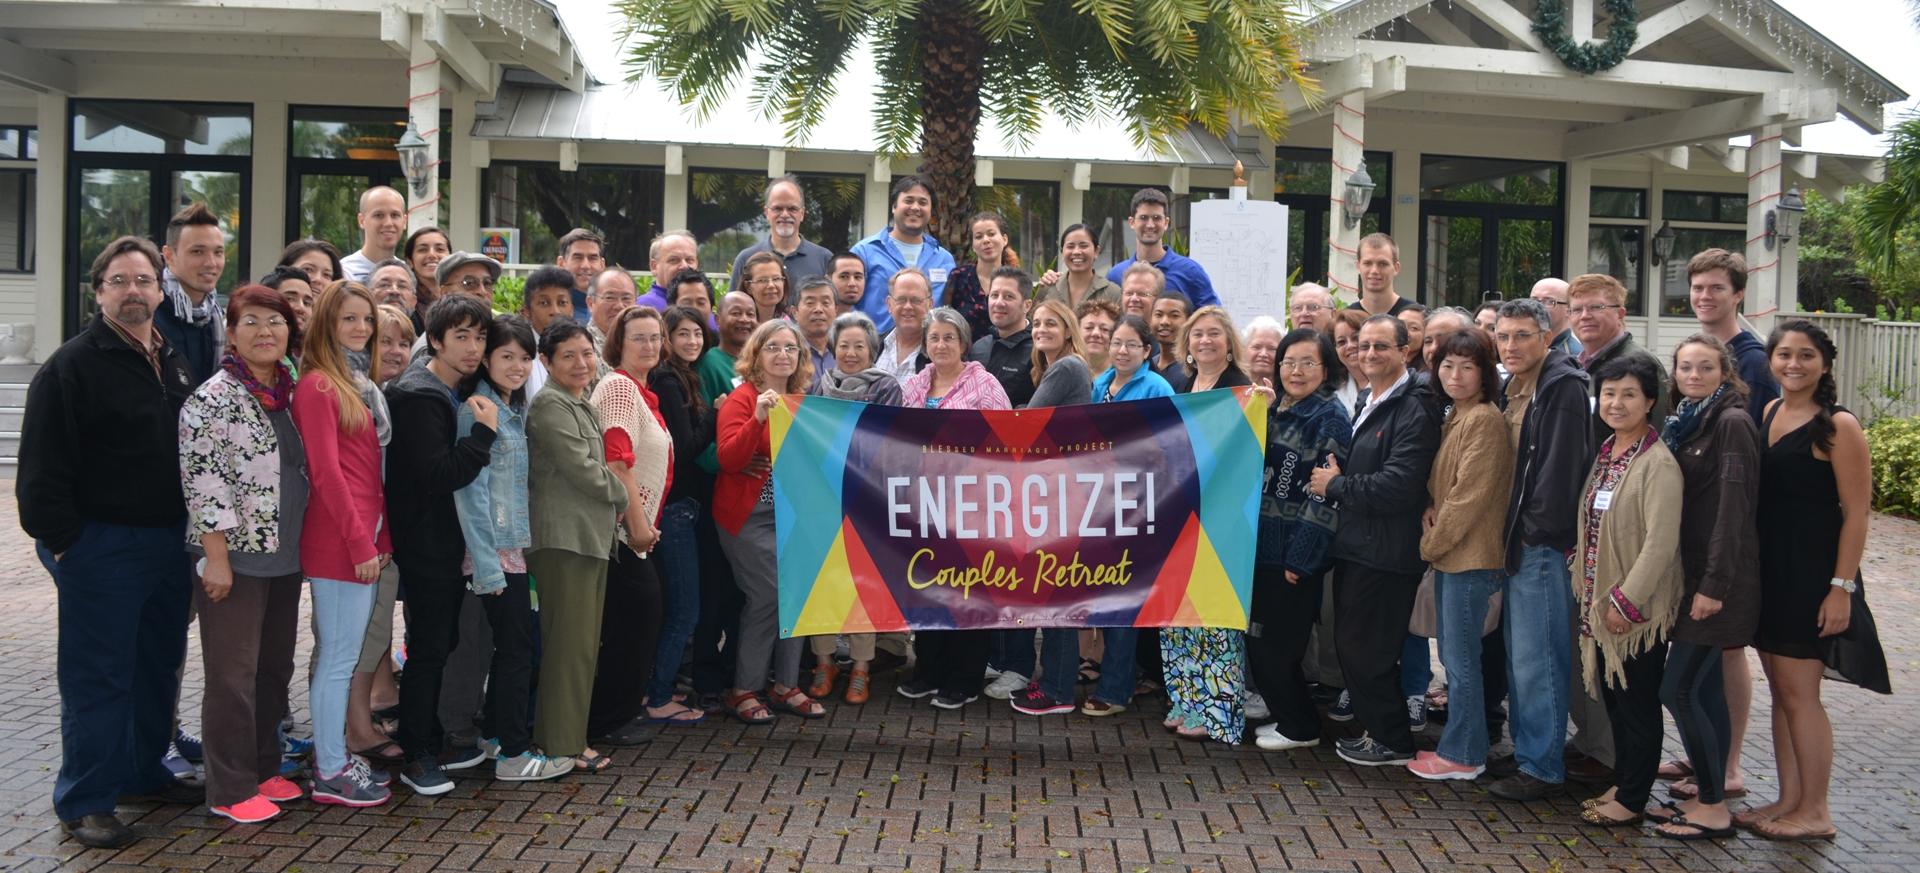 2014 Florida Retreat